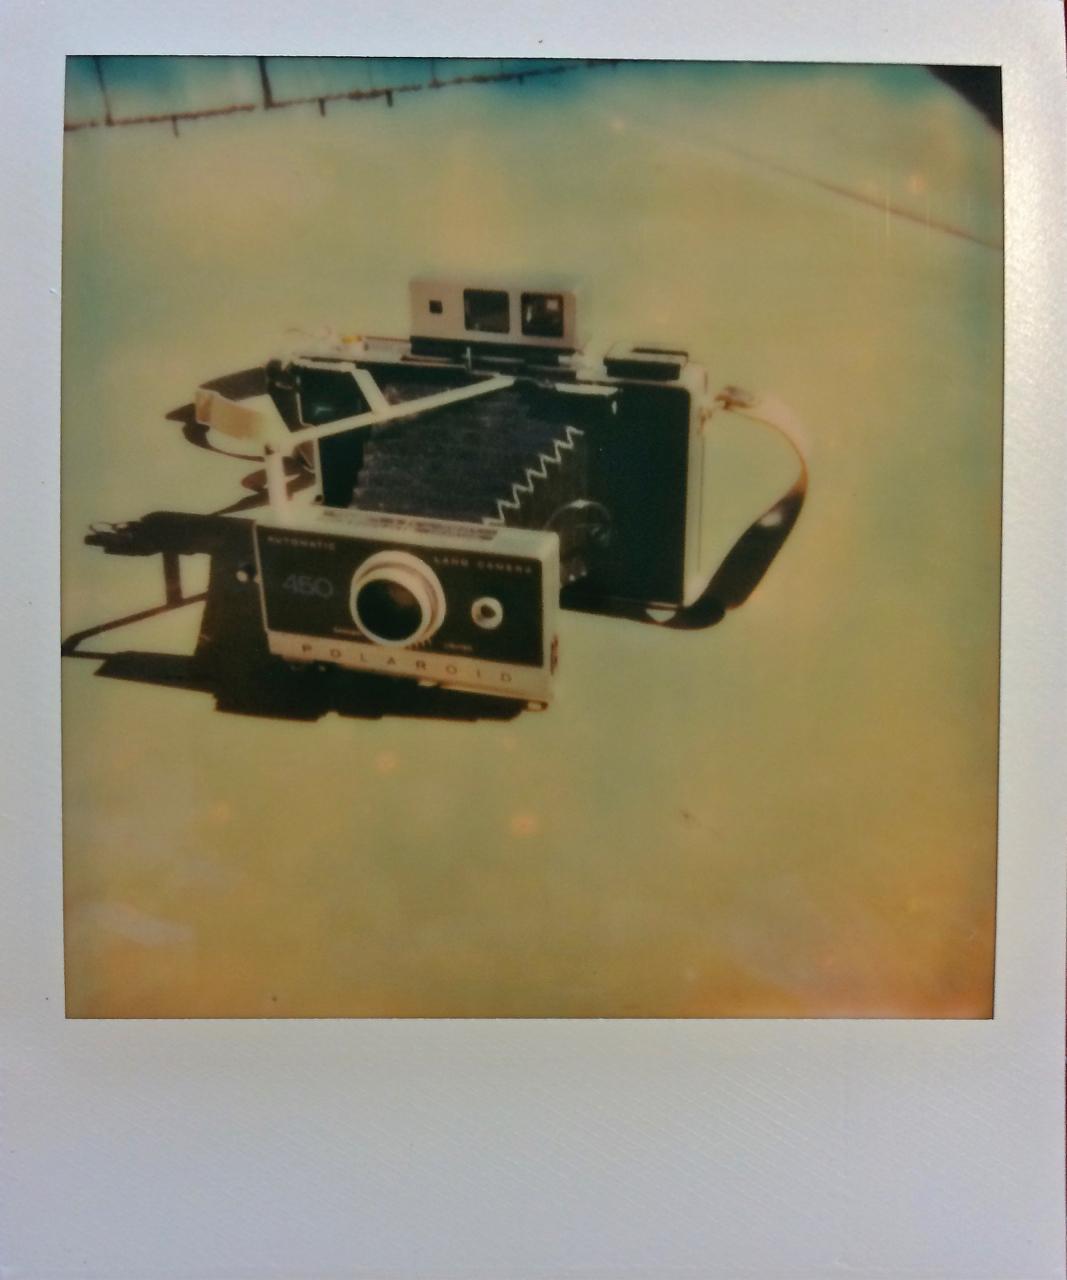 My Polaroid 450 shot with my Polaroid SX-70